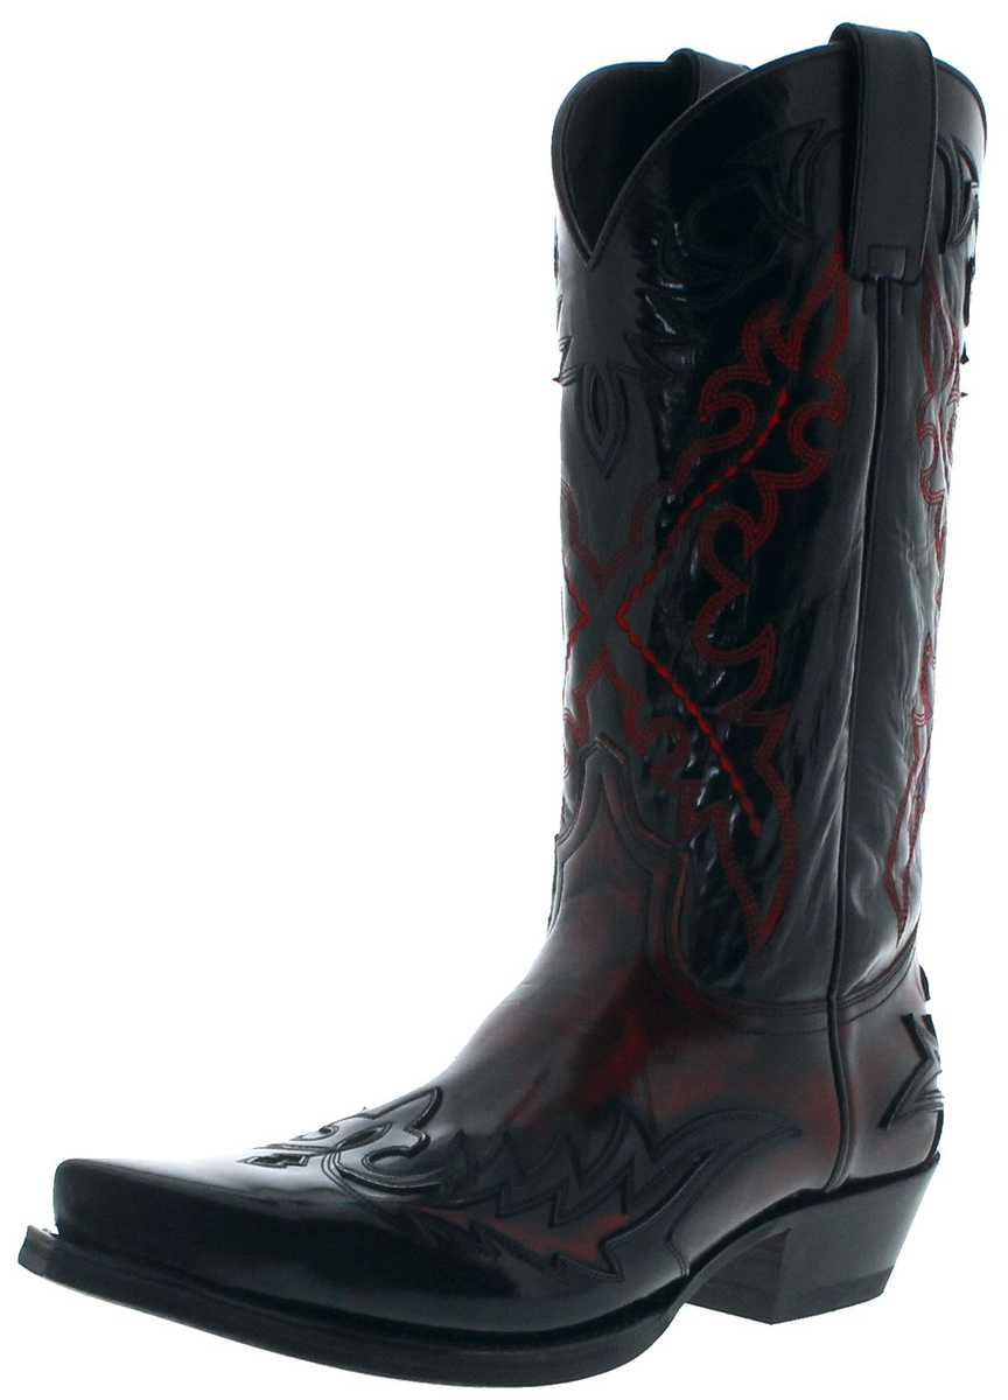 Sendra Boots 9669 Negro Rojo Men Western Boots - black red